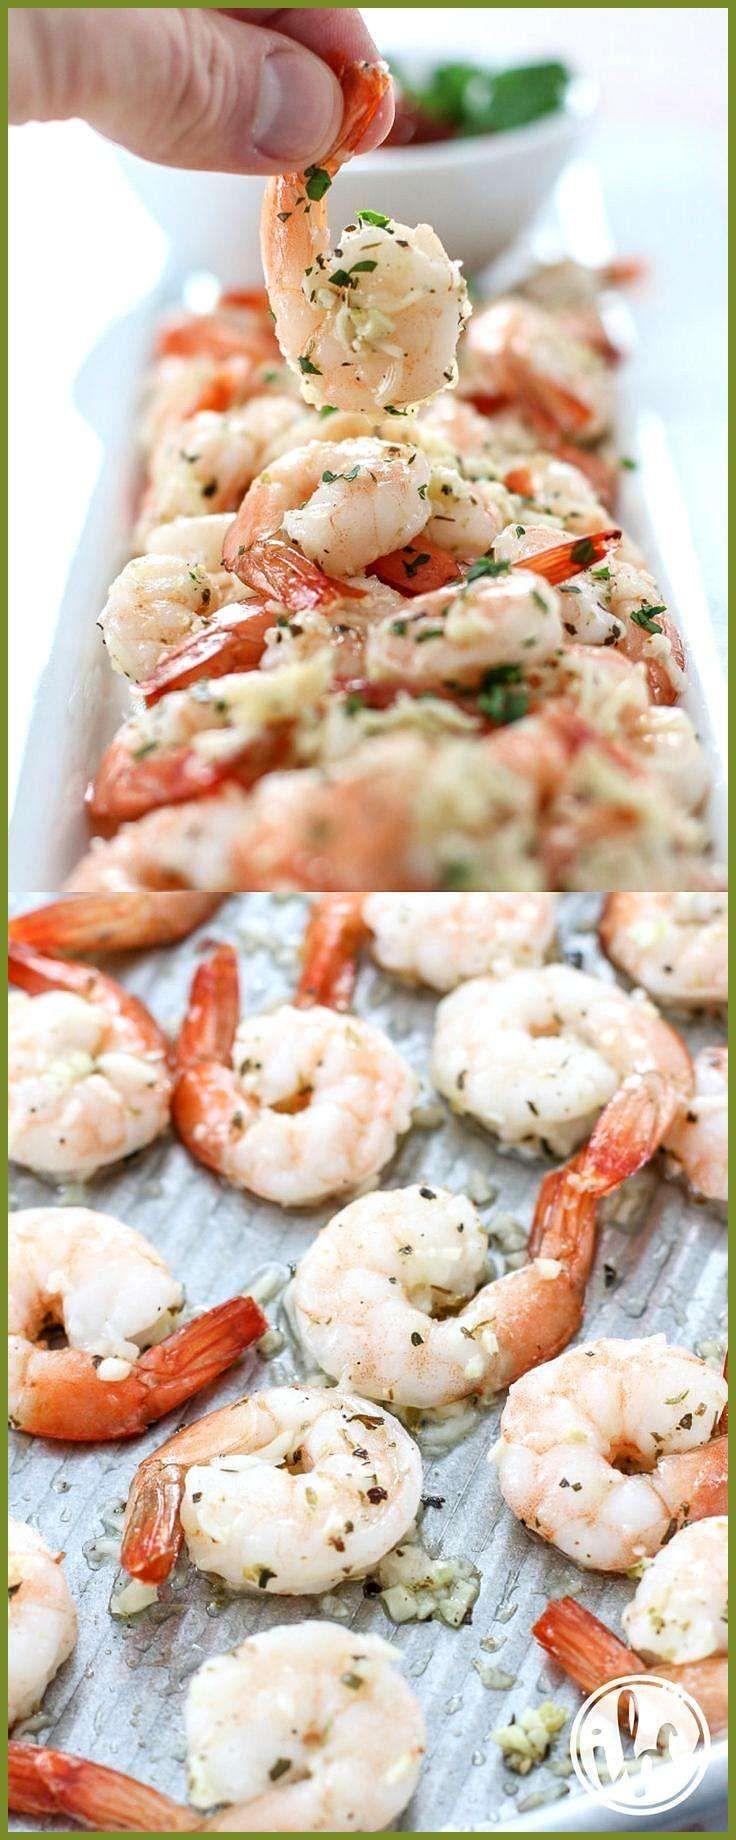 Roasted Garlic Parmesan Shrimp appetizer recipe appetierz no bake appetierz wreath